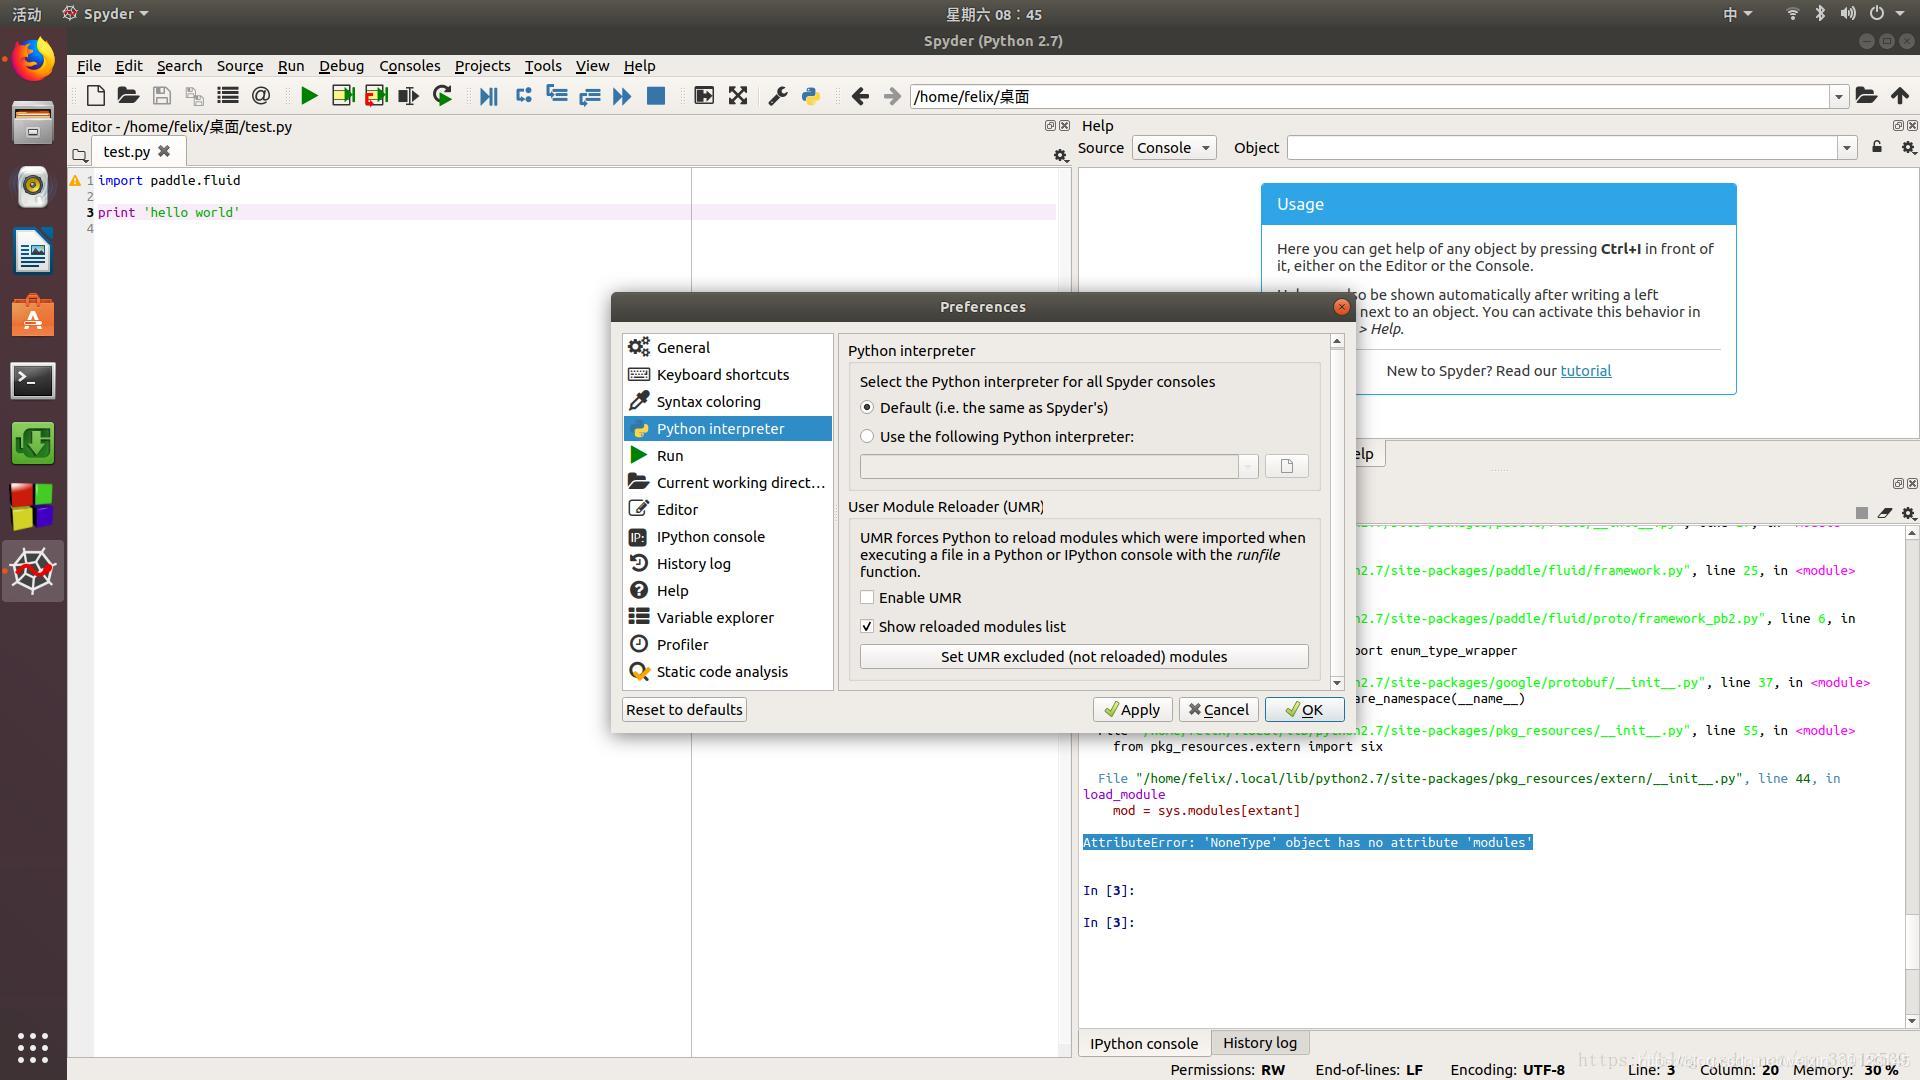 Spyder runs Reloaded modules: **AttributeError: 'NoneType' object